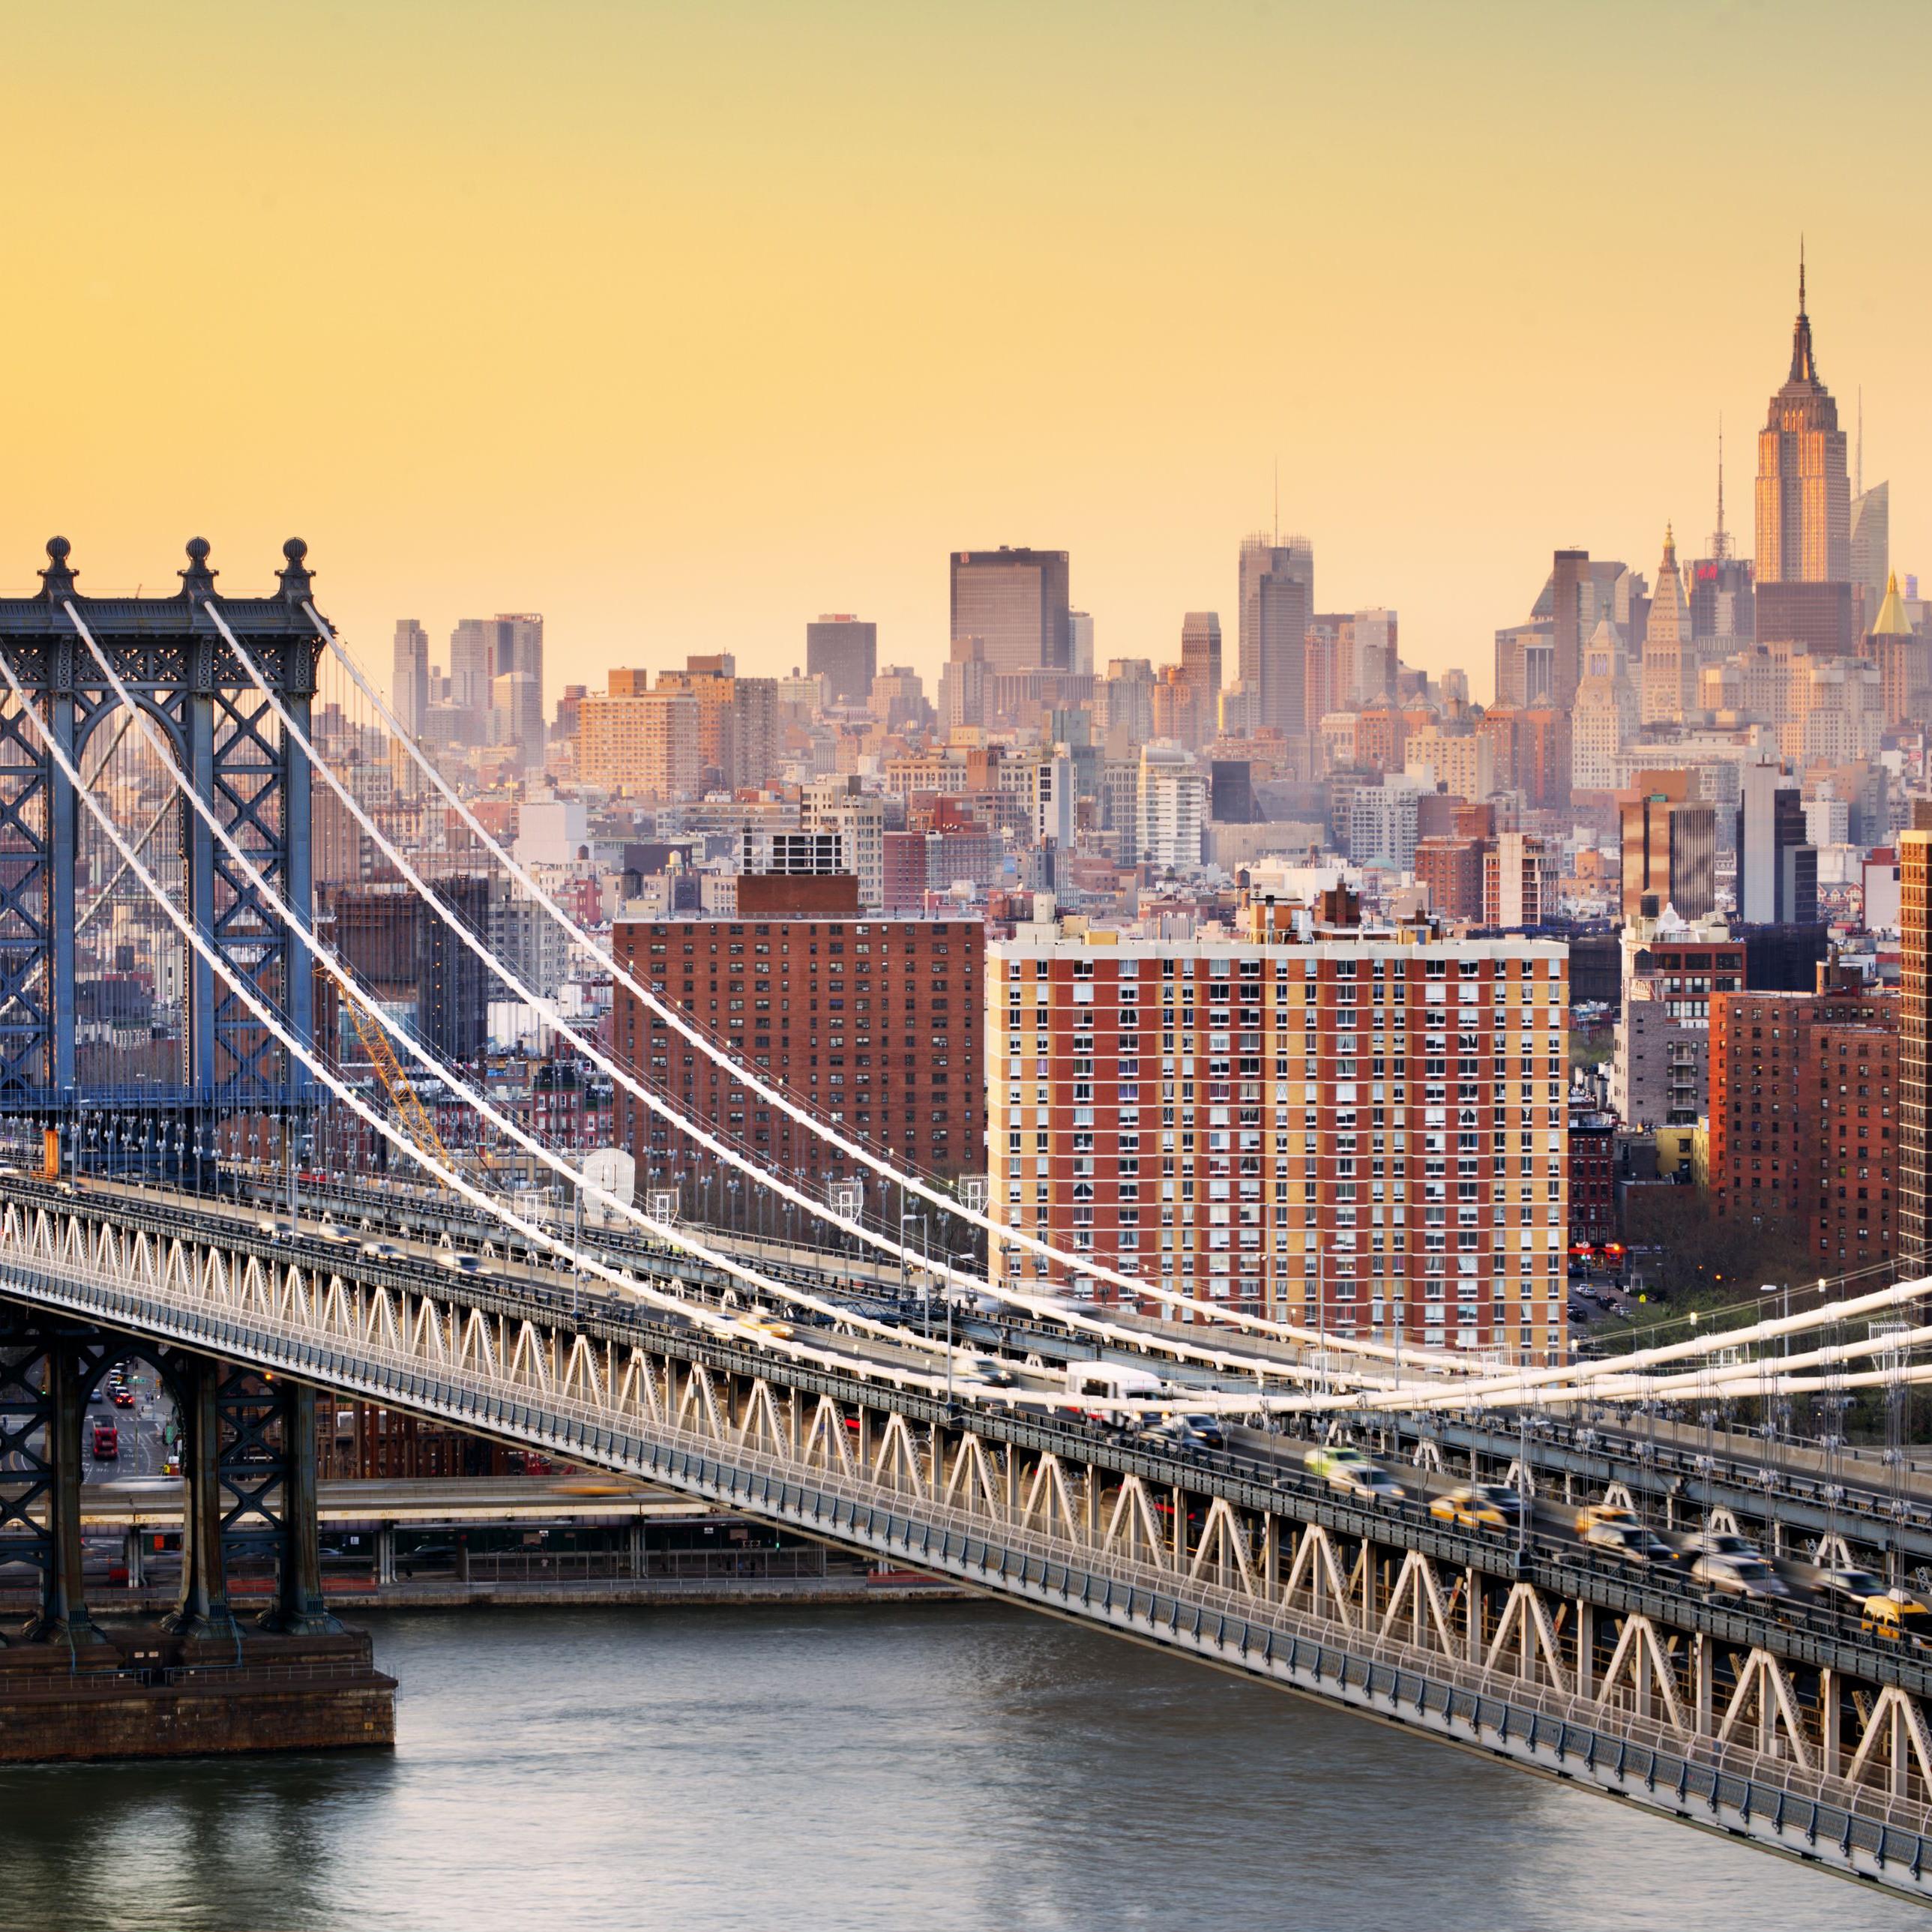 Flüge USA / New York Hin und Rückflug von Amsterdam (Januar - März) ab 208€